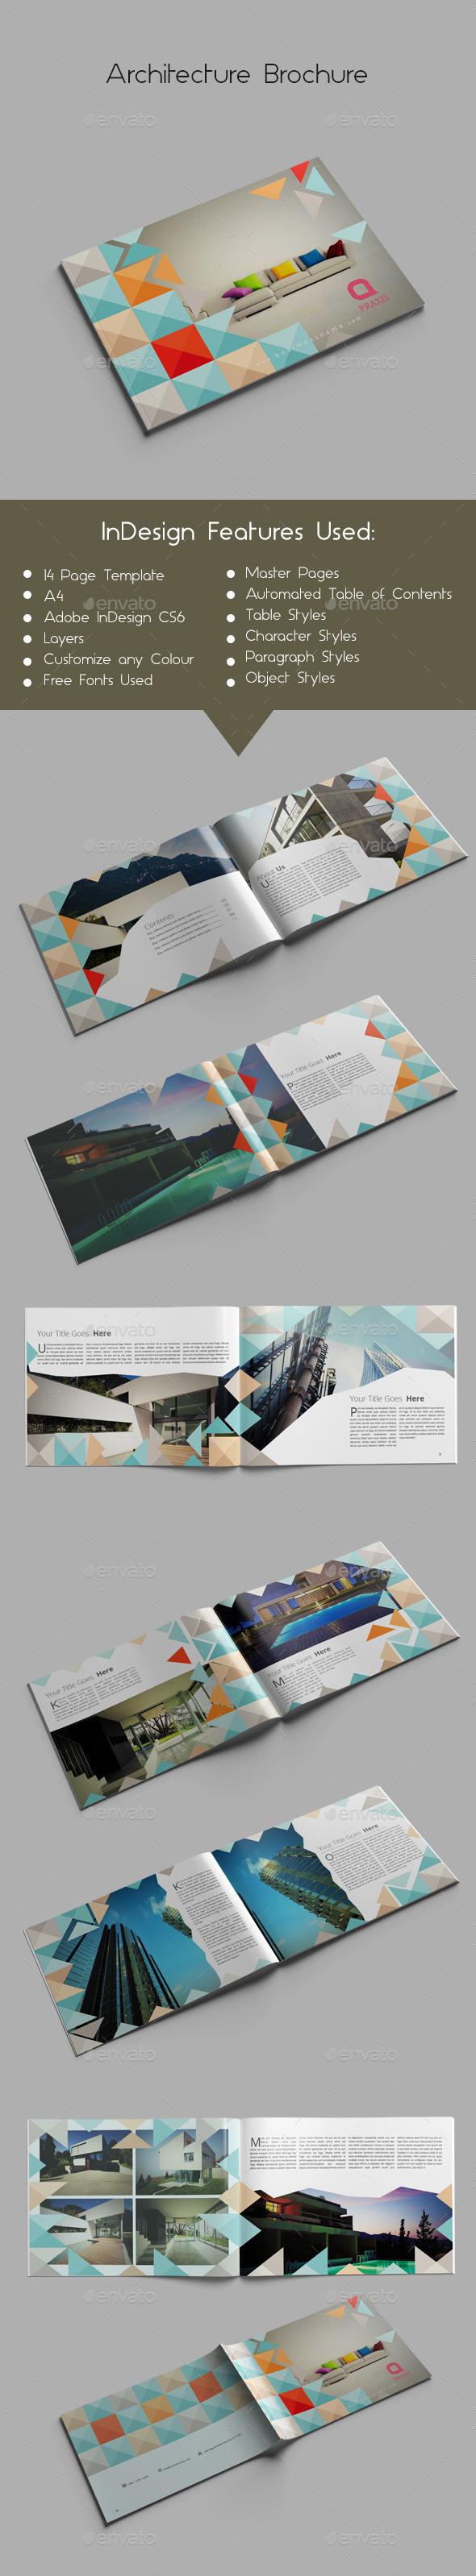 Architecture Brochure - Brochures Print Templates